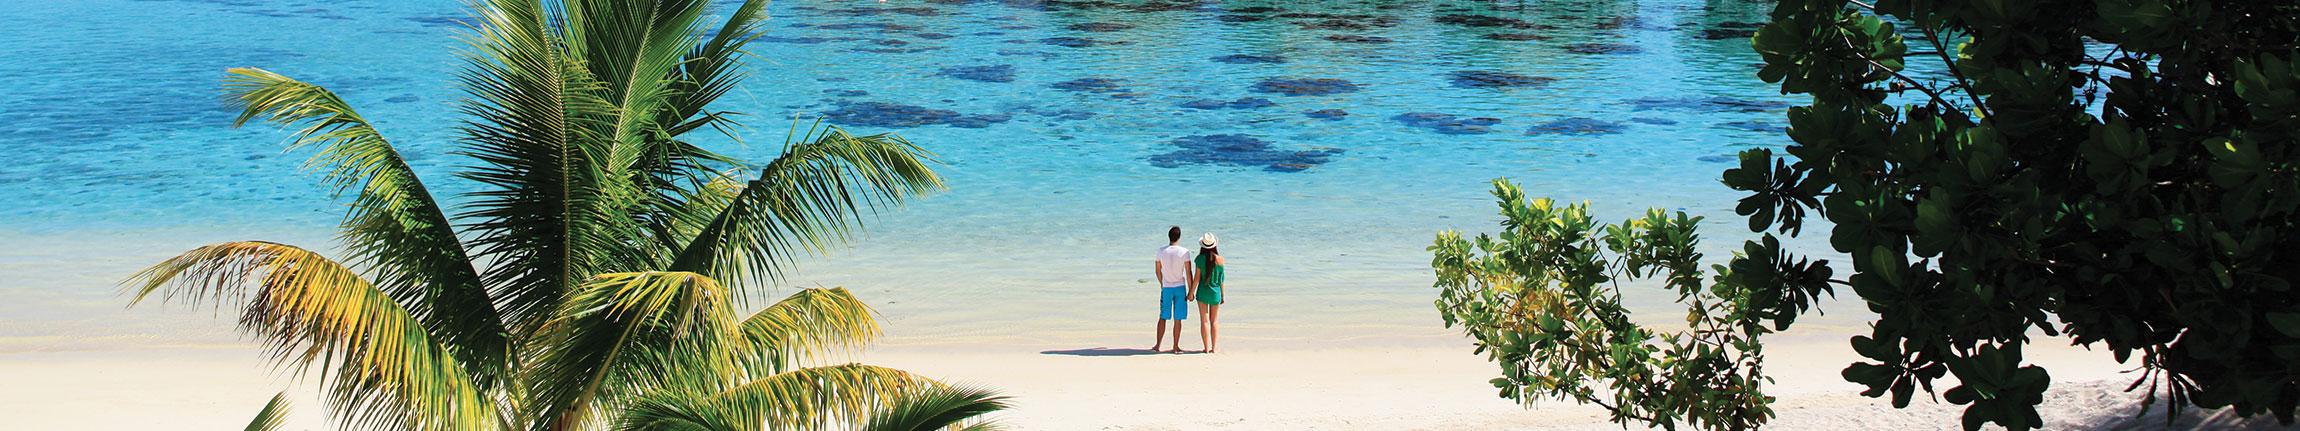 séjours-îles-de-la-societe-moorea-bandeau-plage-e-tahiti-travel